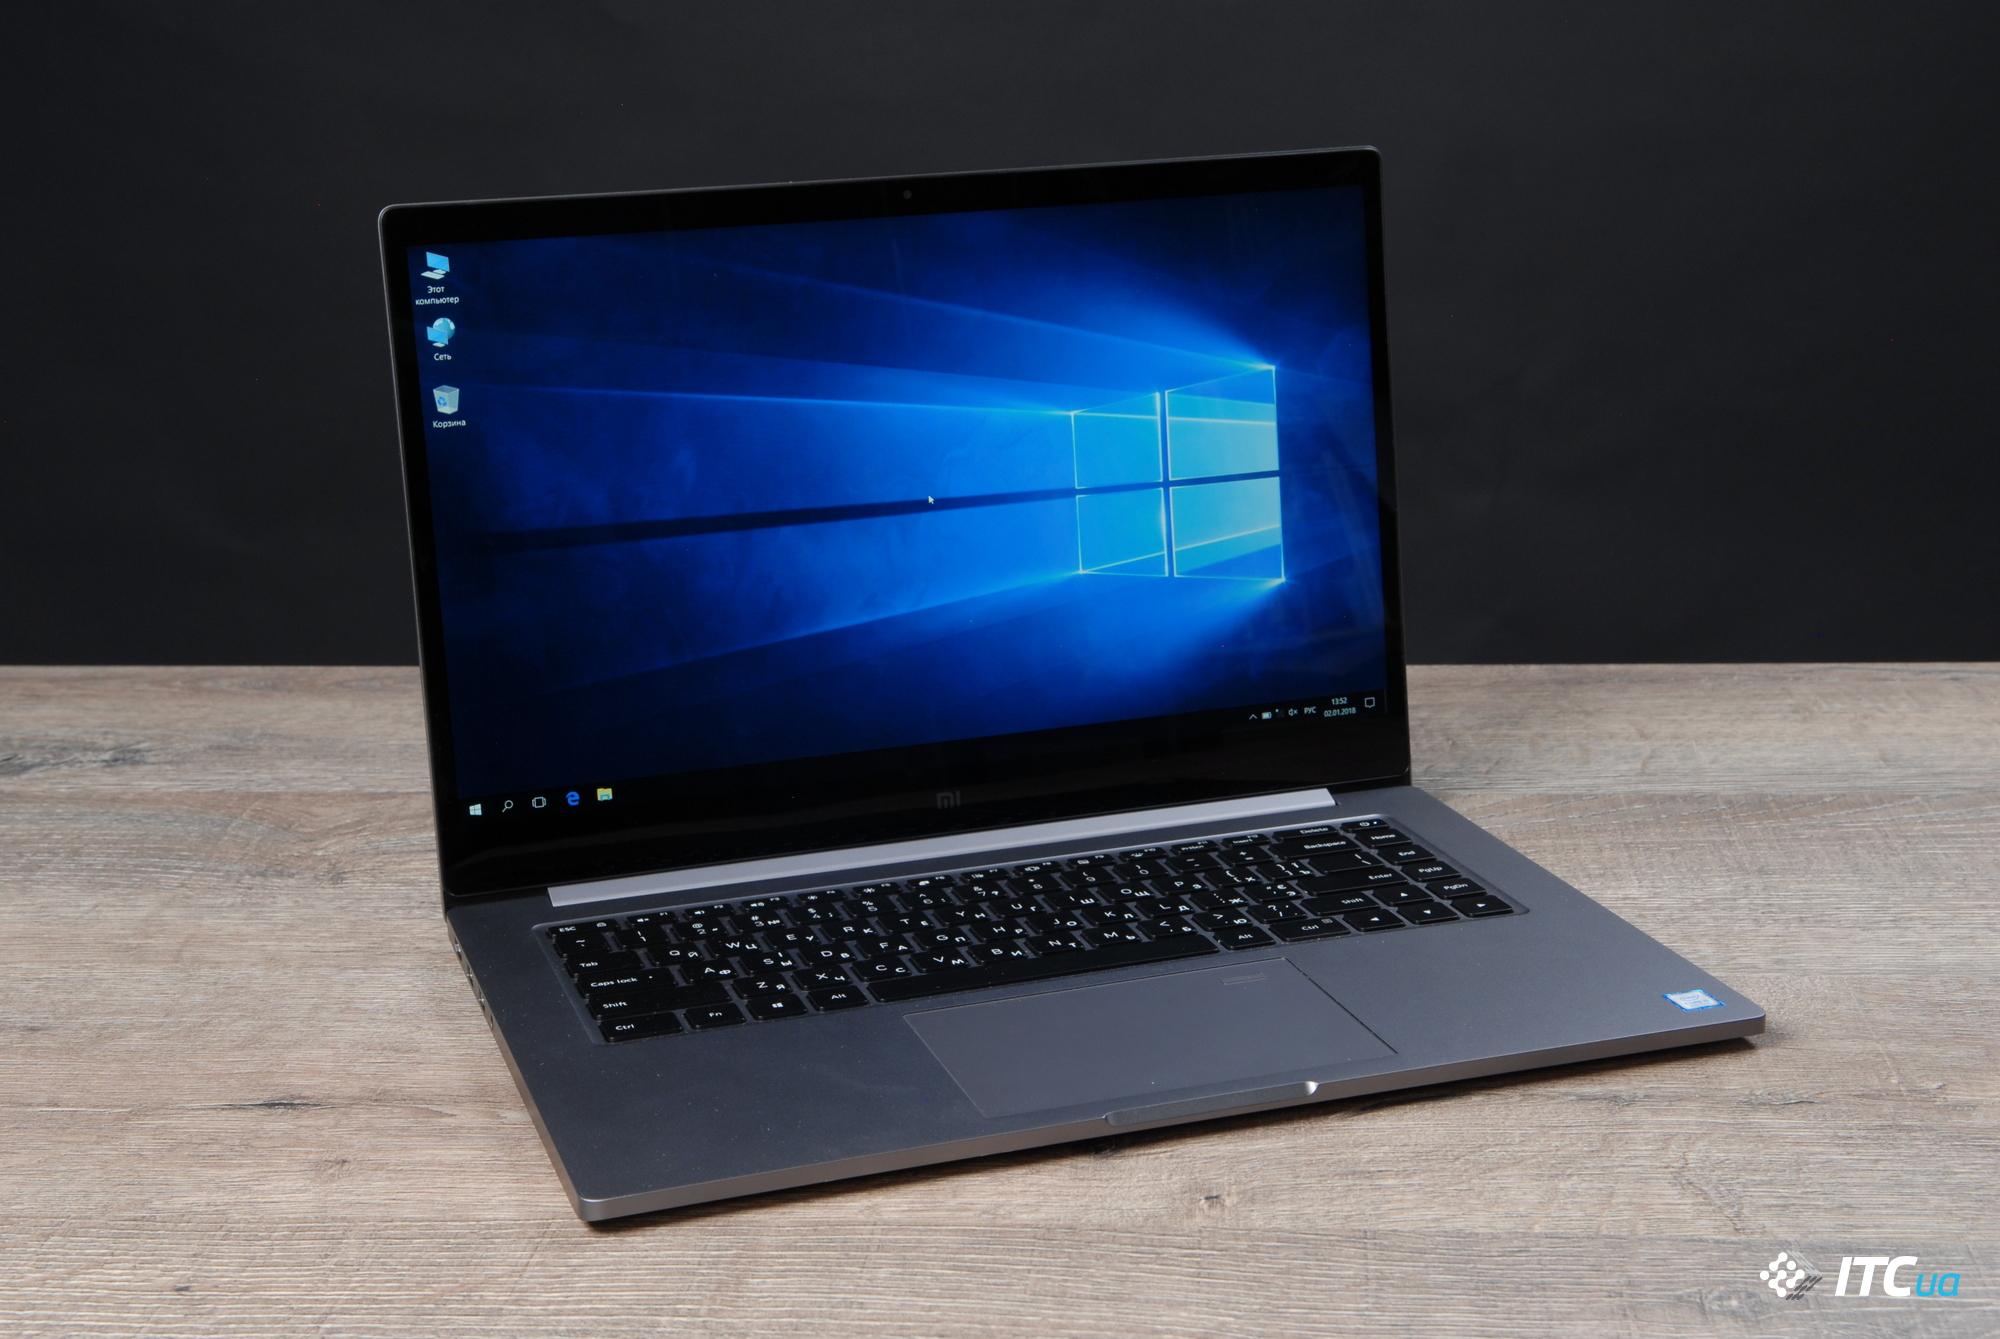 Obzor Noutbuka Xiaomi Mi Notebook Pro 15 6 Itc Ua